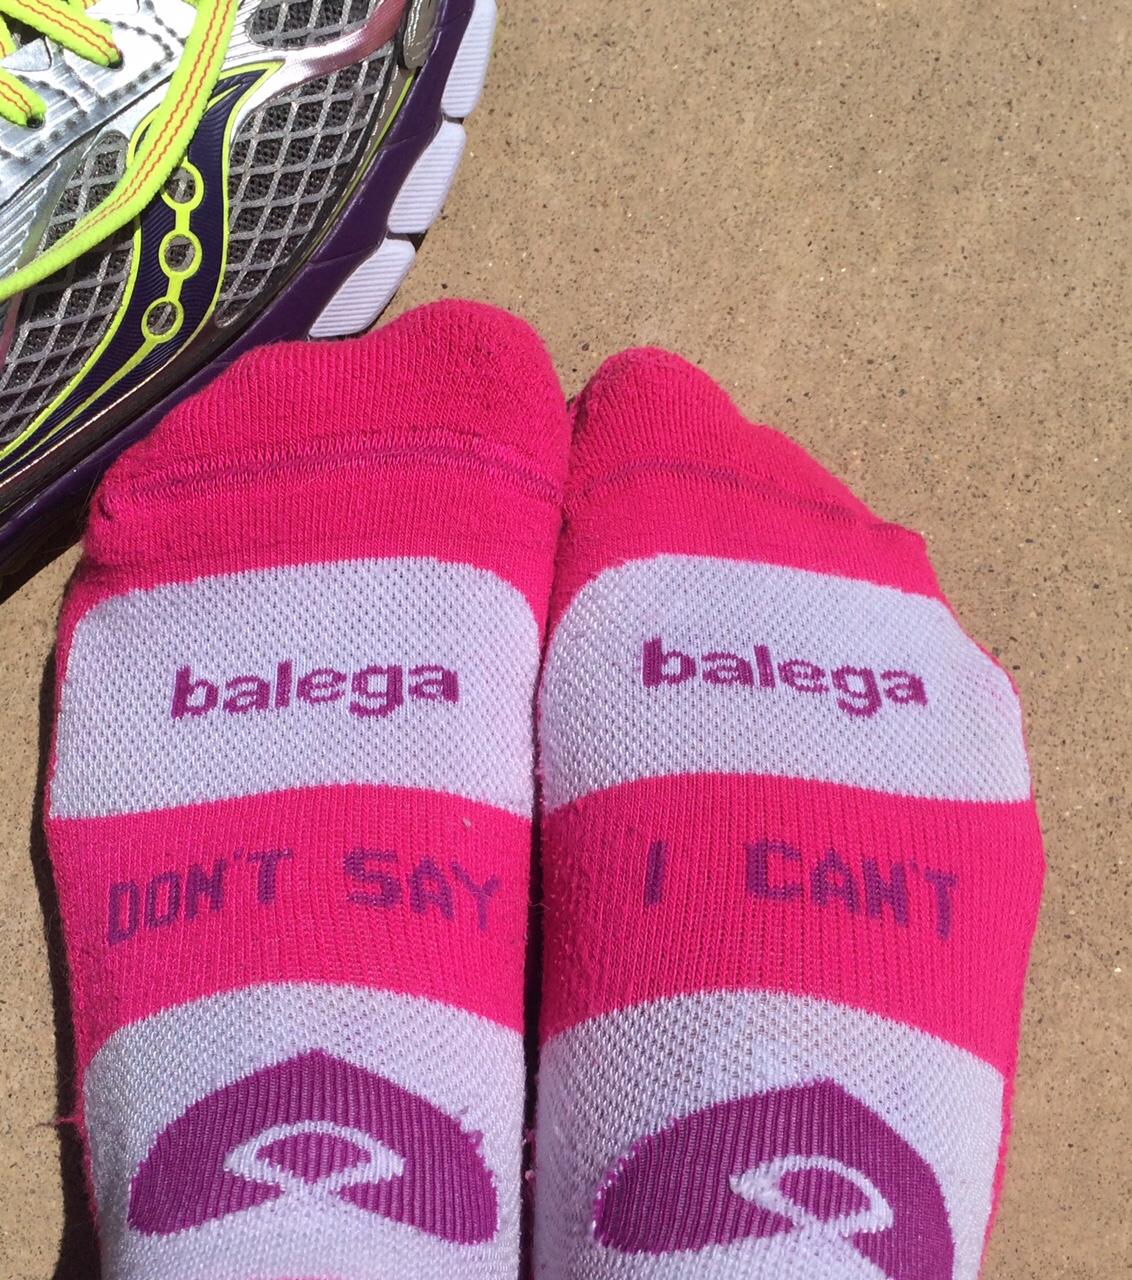 Sometimes it's as simple as a good pair of socks ...